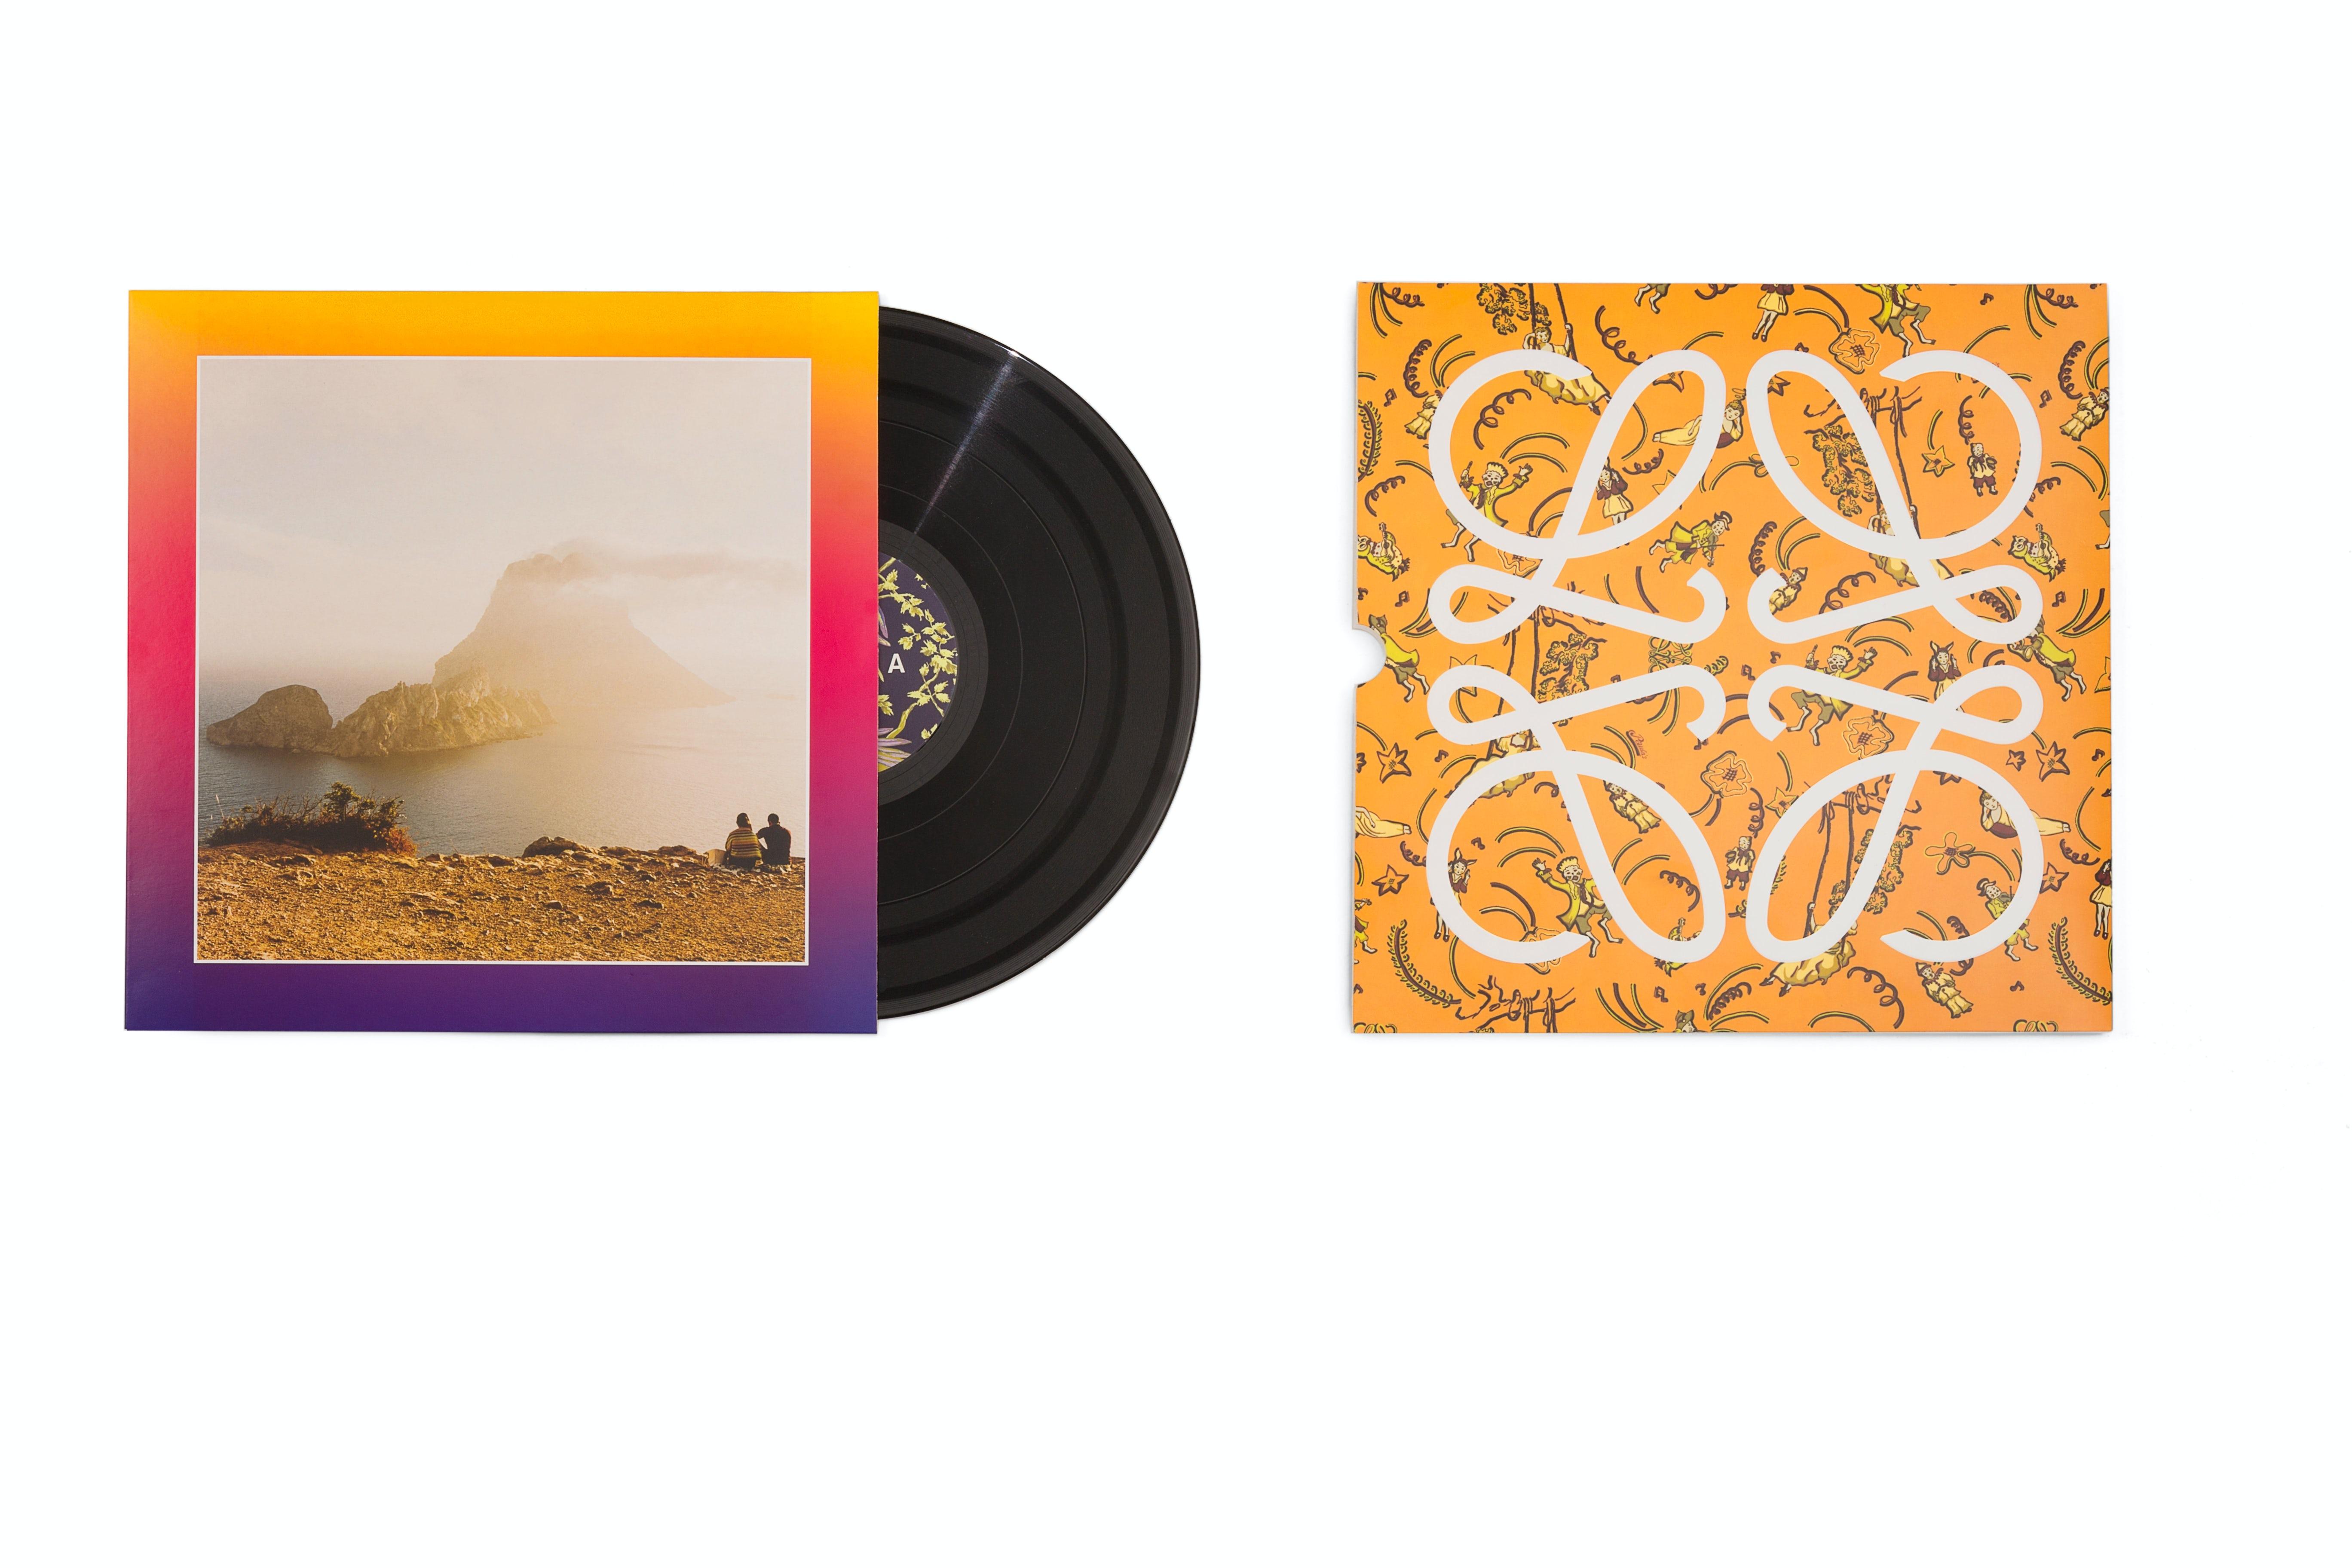 News Bites | Loewe Releases Ibiza-Inspired Record, Erdem x H&M